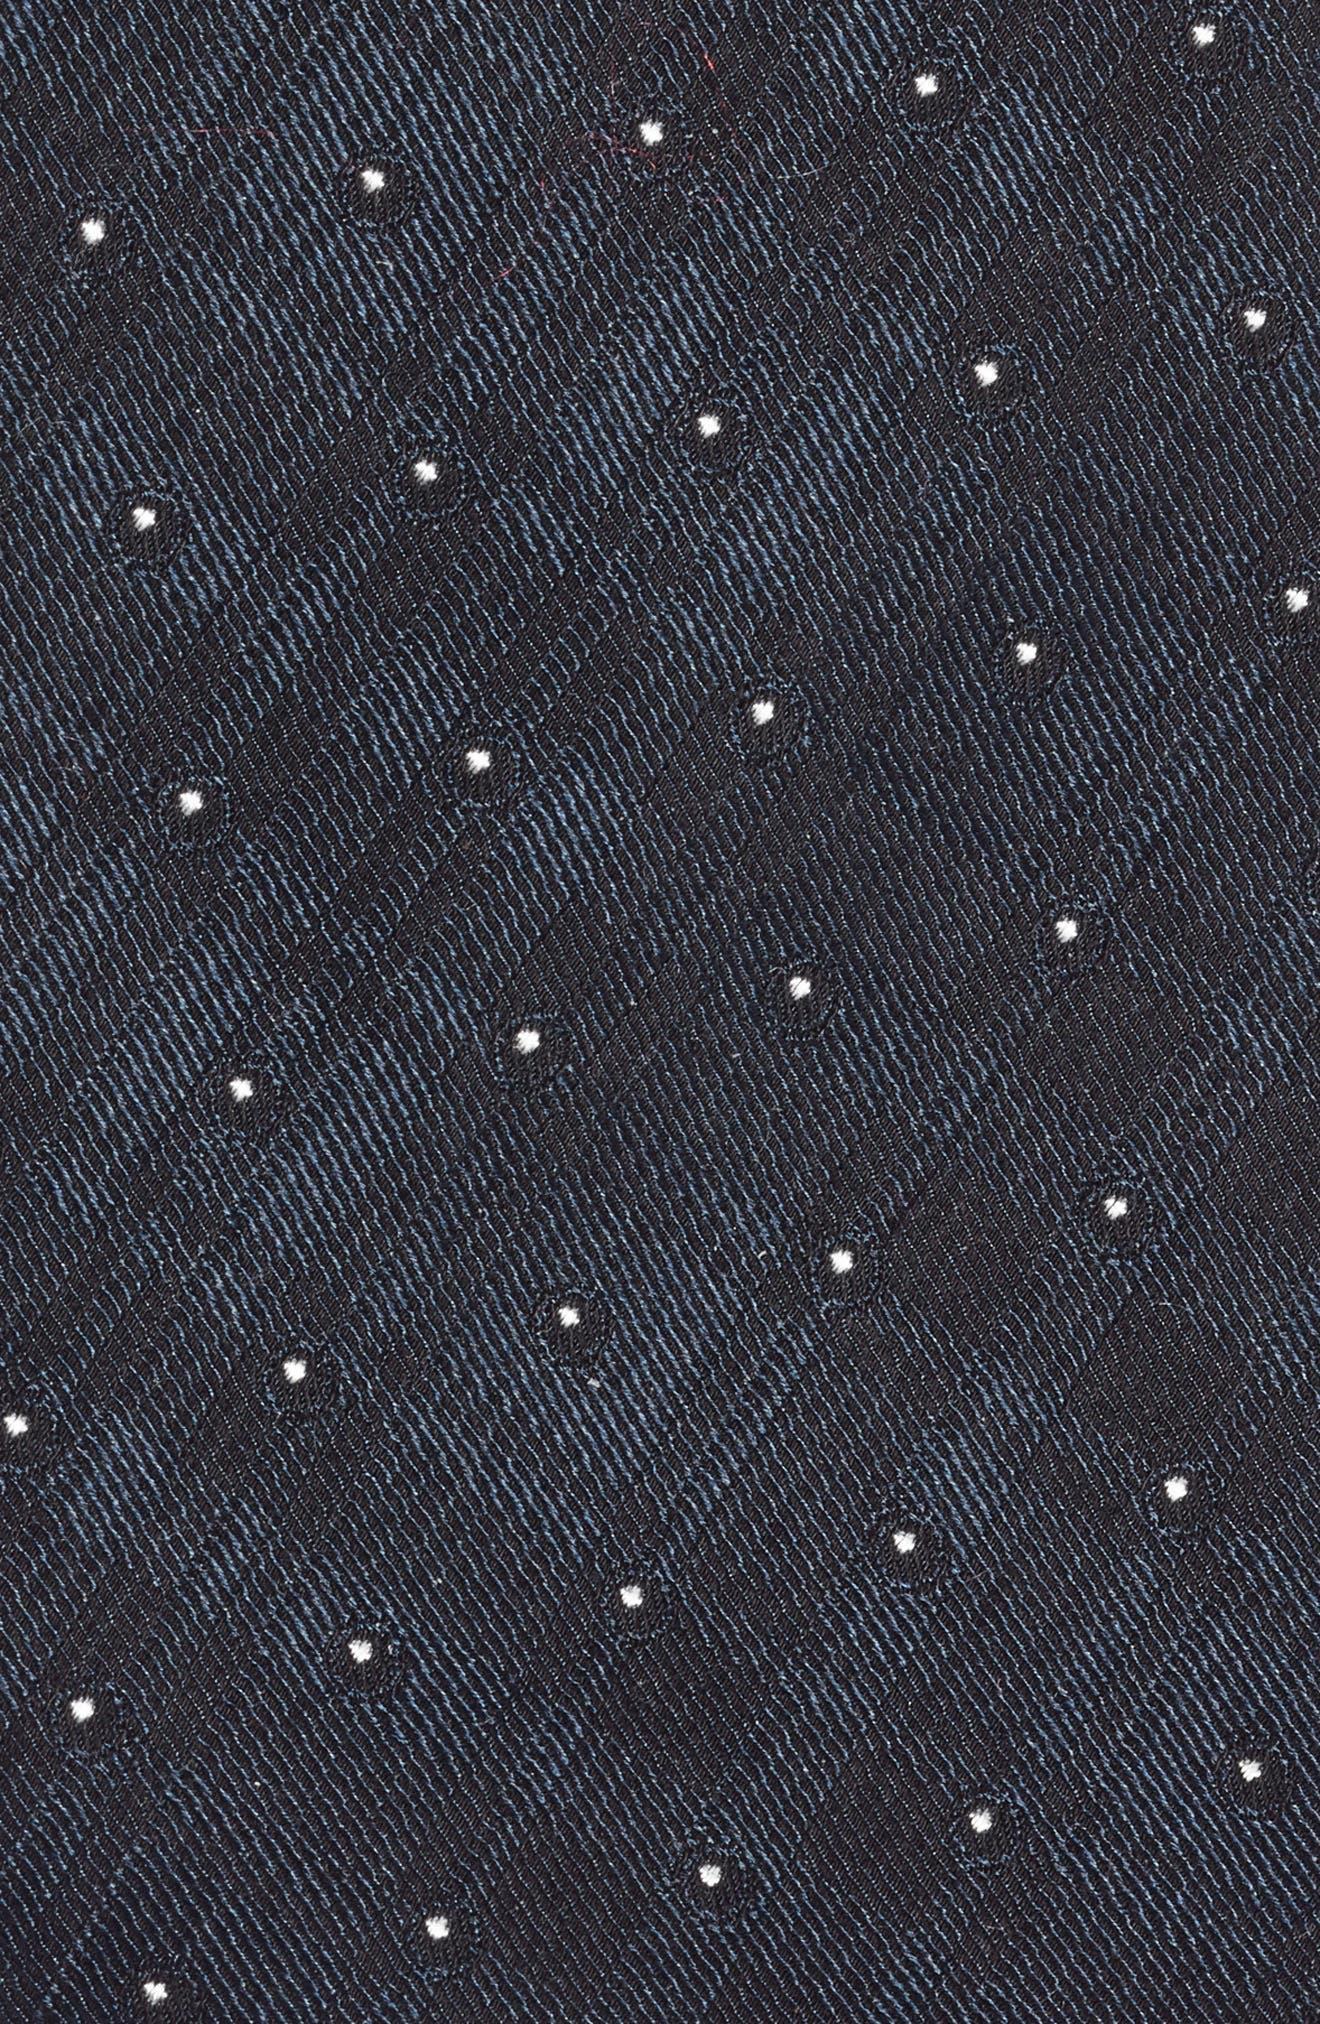 Dot Crosshatch Tie,                             Alternate thumbnail 2, color,                             NAVY